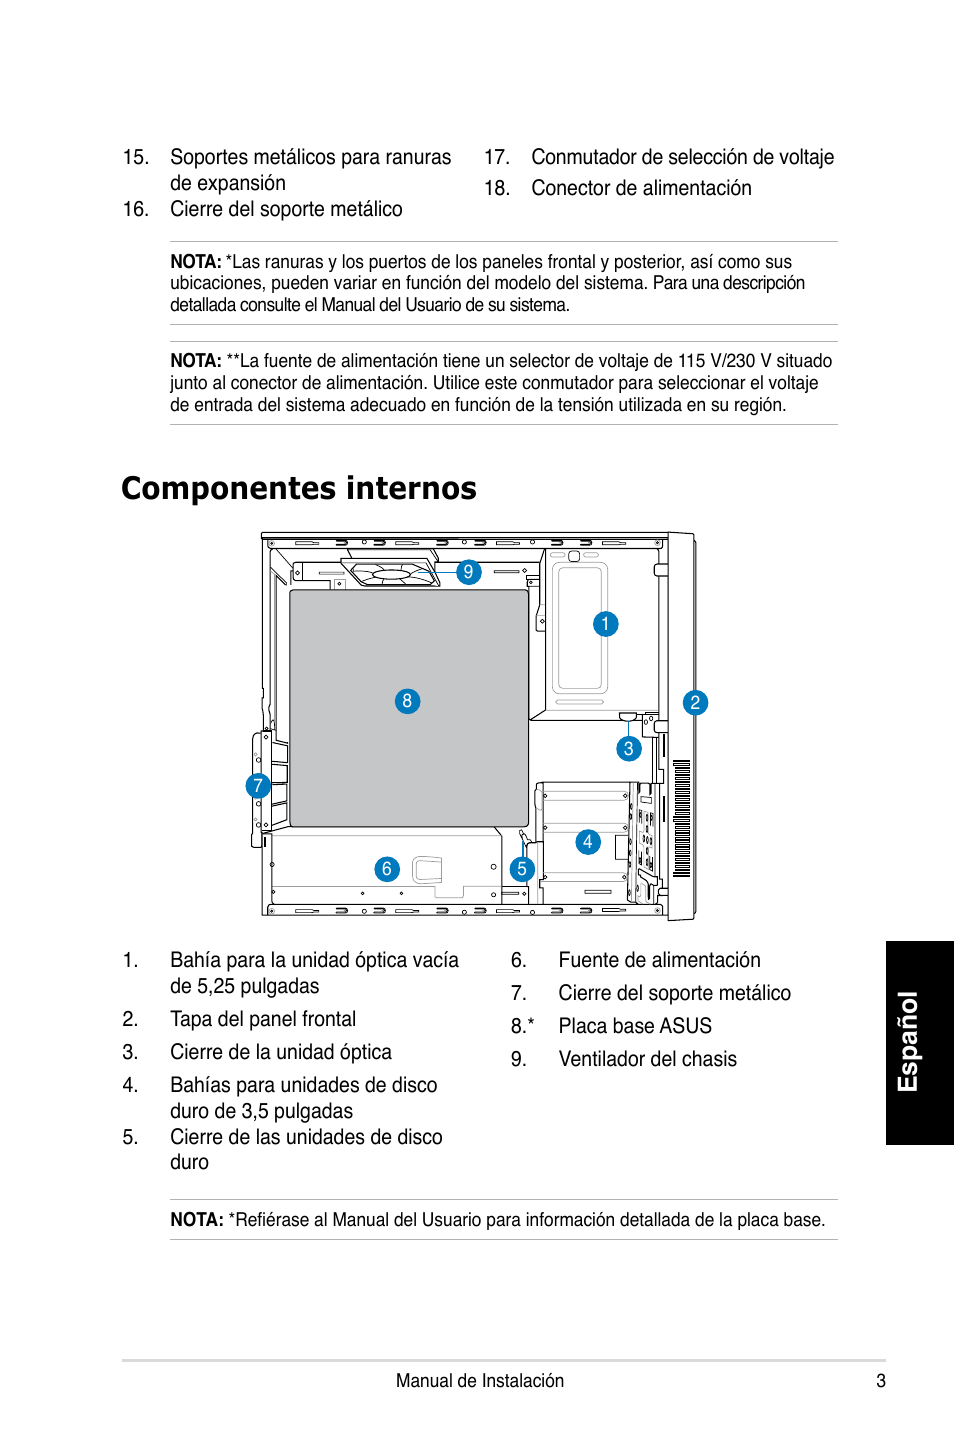 P3 Manual Samsung Rf4287hars Wiring Diagram Array Componentes Internos Espa Ol Asus Ph4 User Page 35 Rh Manualsdir Com